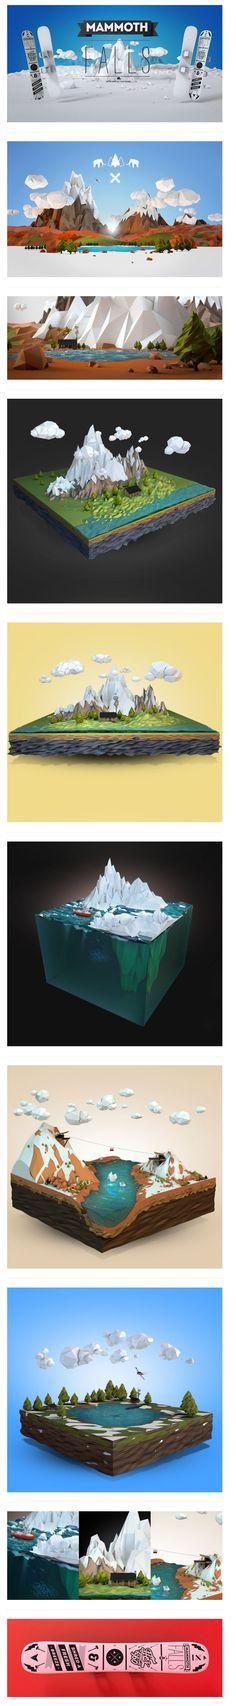 Mammoth Falls By Aldo Pulella  3d, Low Poly, Art Direction    http://www.behance.net/gallery/Mammoth-Falls/7294315 #inspiration #cinema4d #3d: